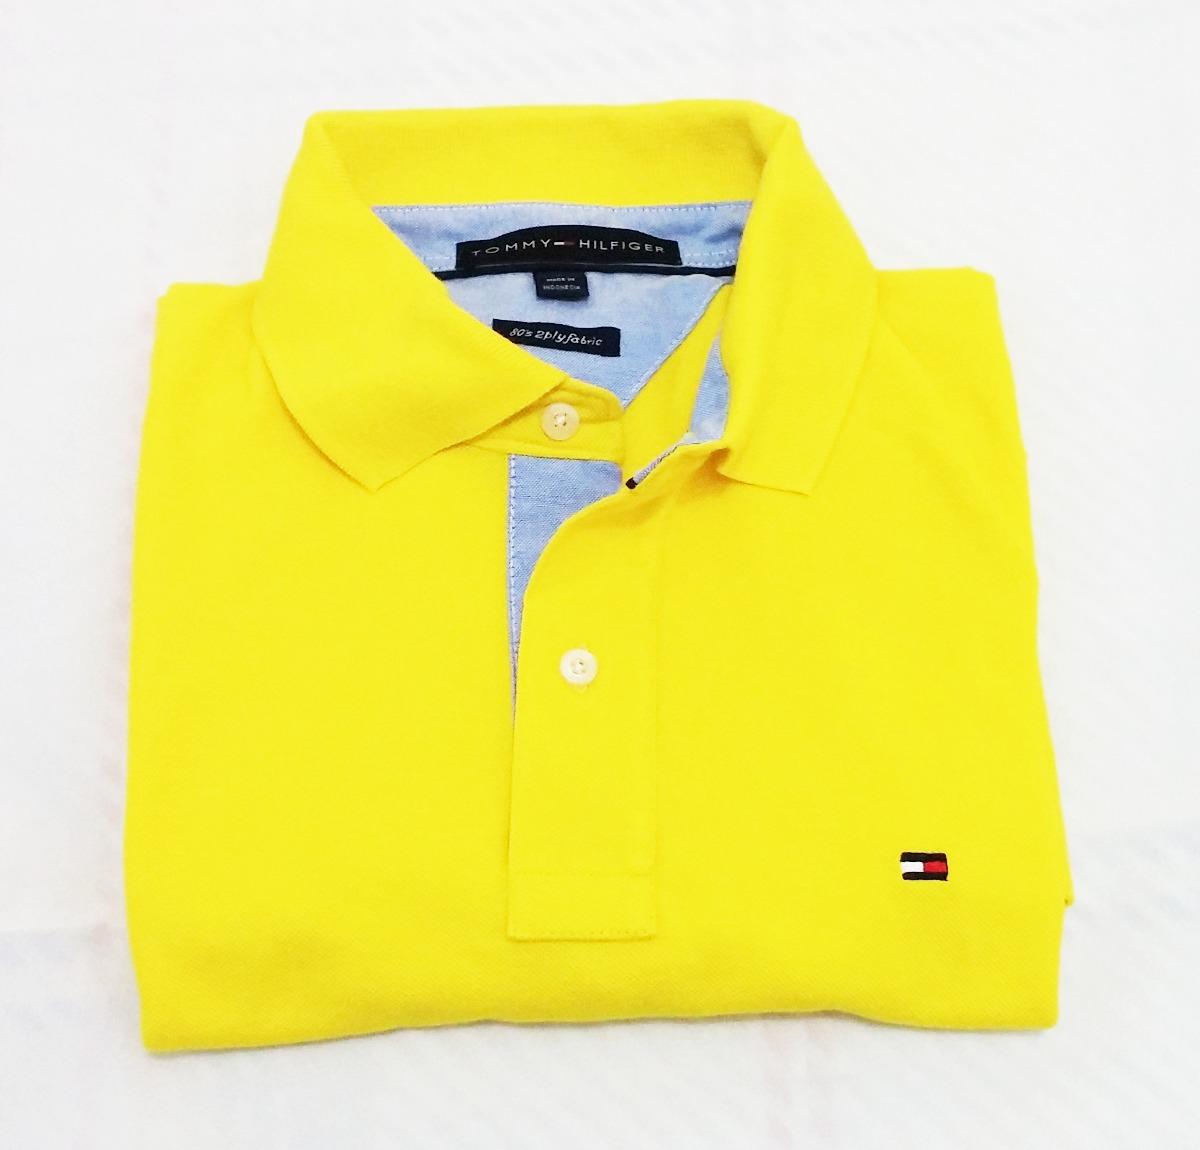 4a0fbae8d699b camisa camiseta polo tommy hilfiger amarela. Carregando zoom.